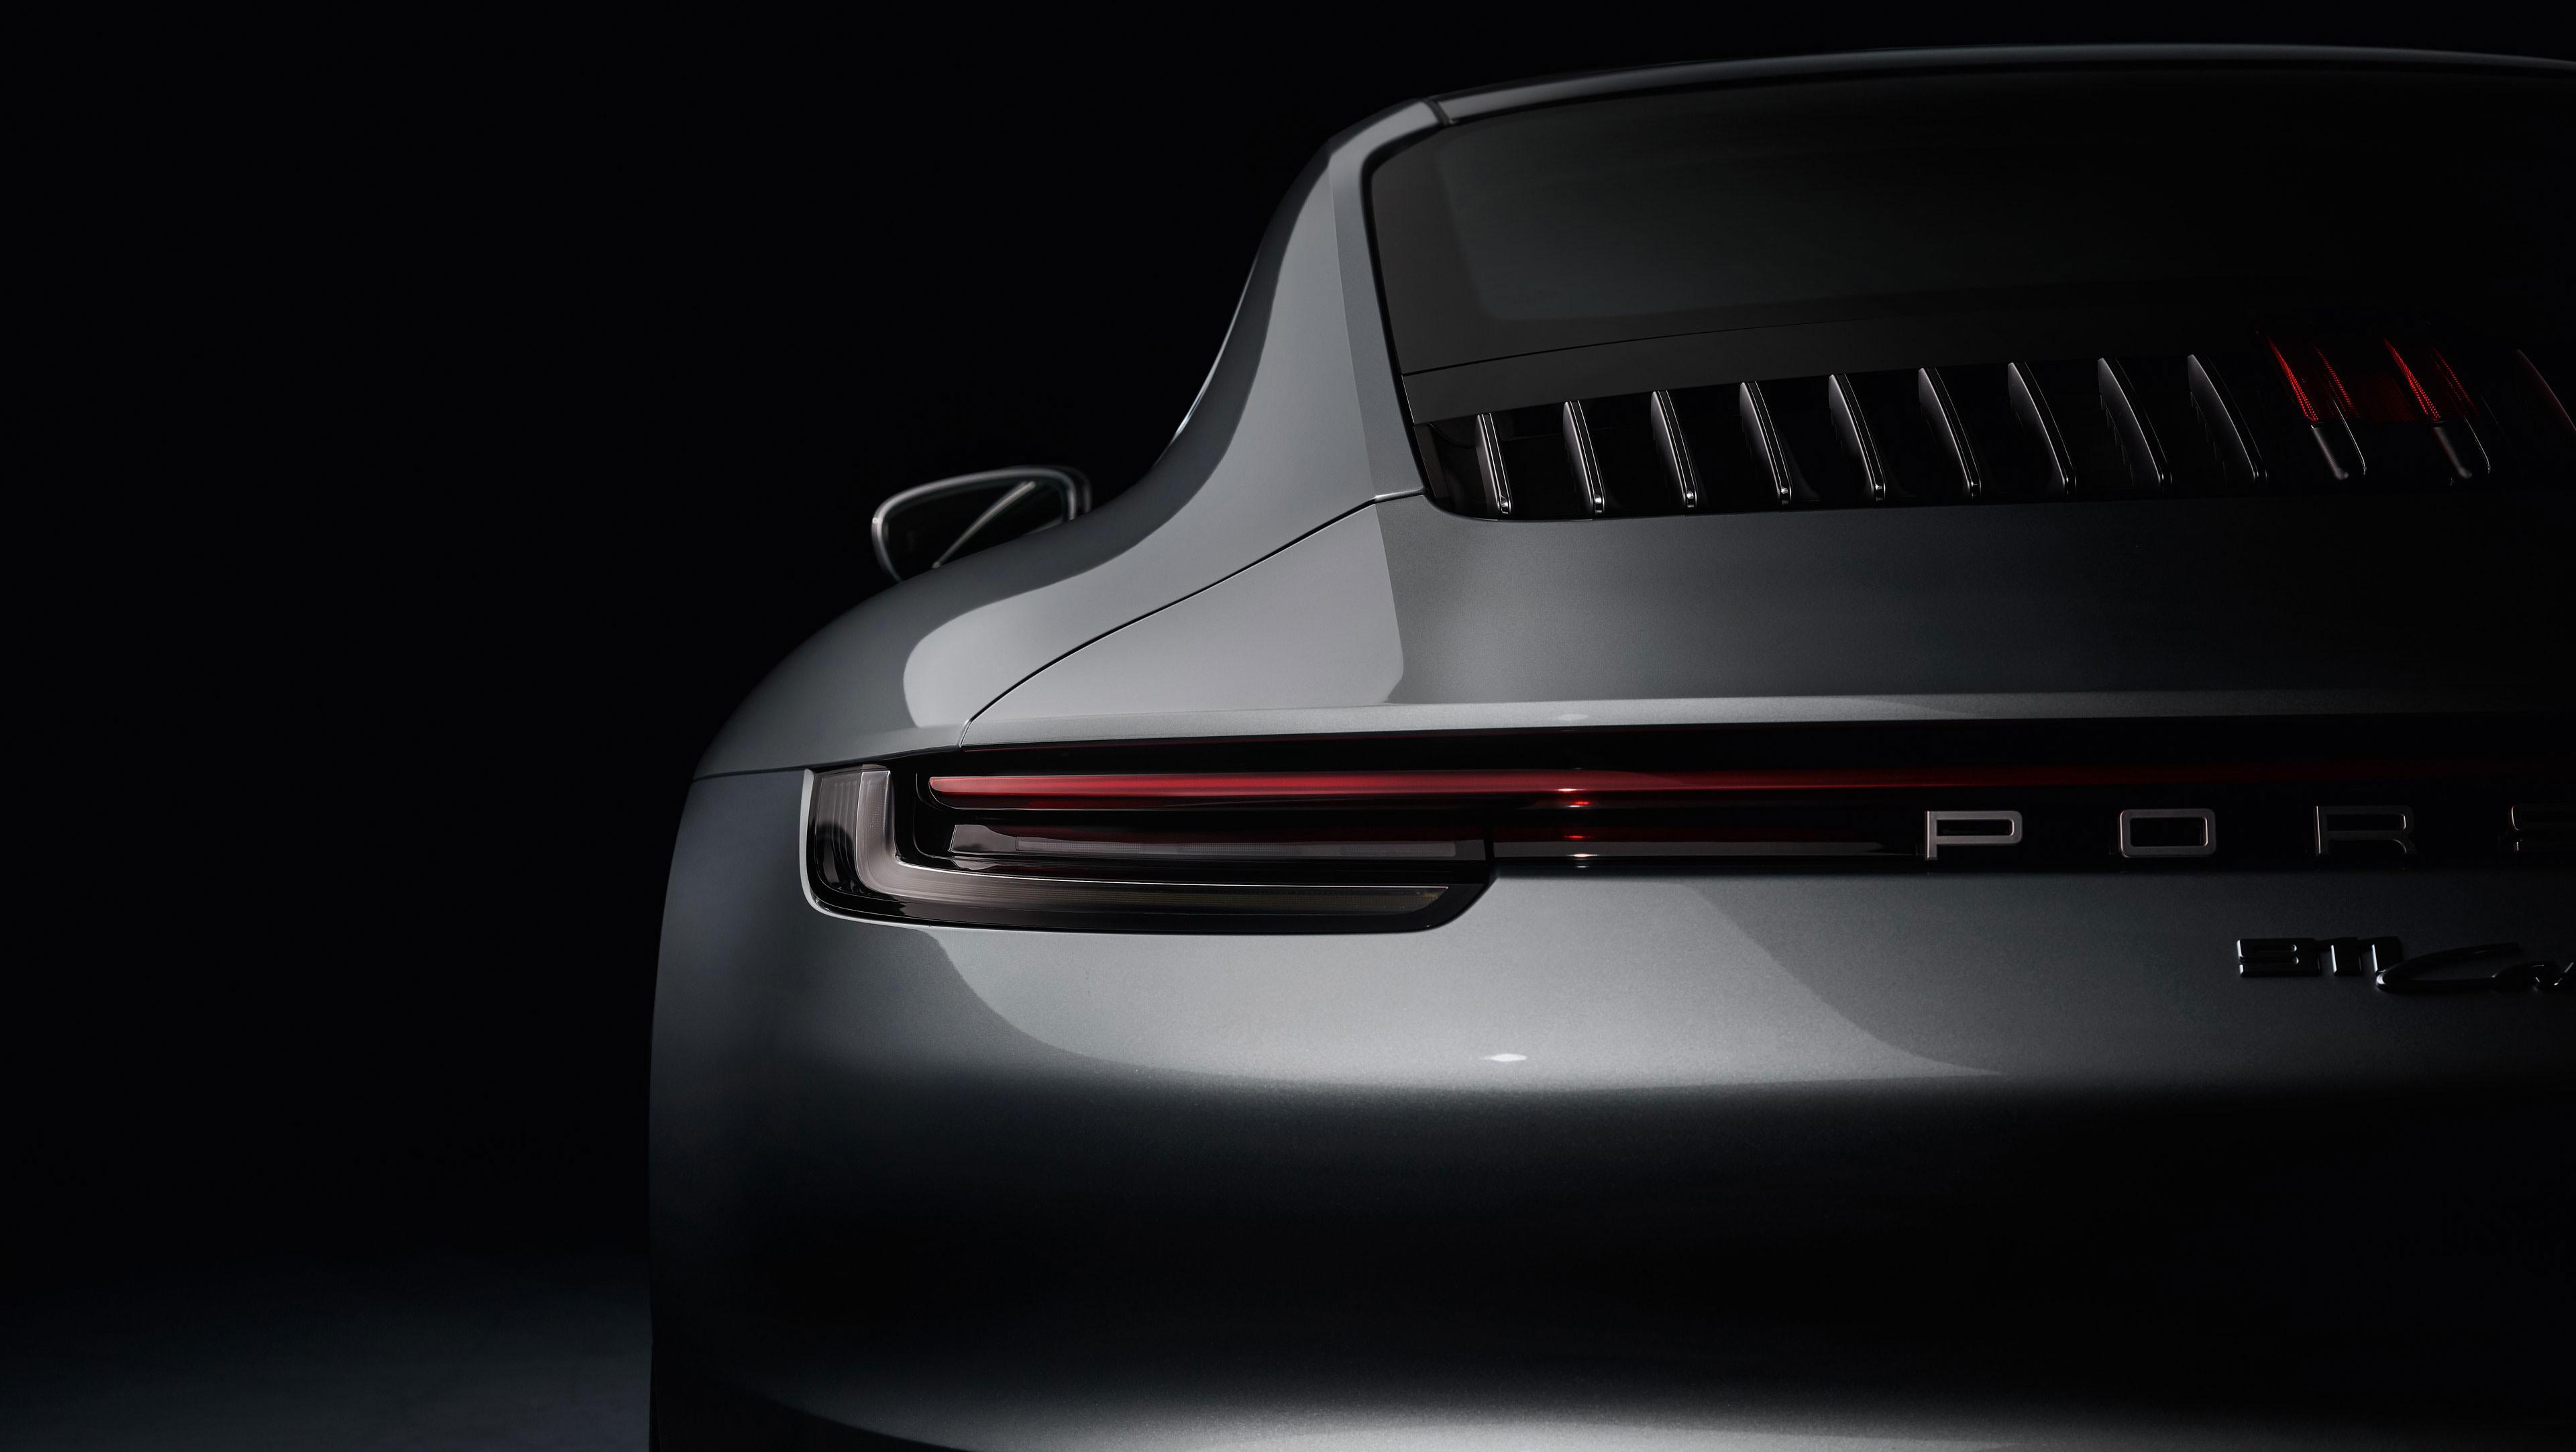 Porsche 911 Carrera S 2019 Rear Hd Cars 4k Wallpapers